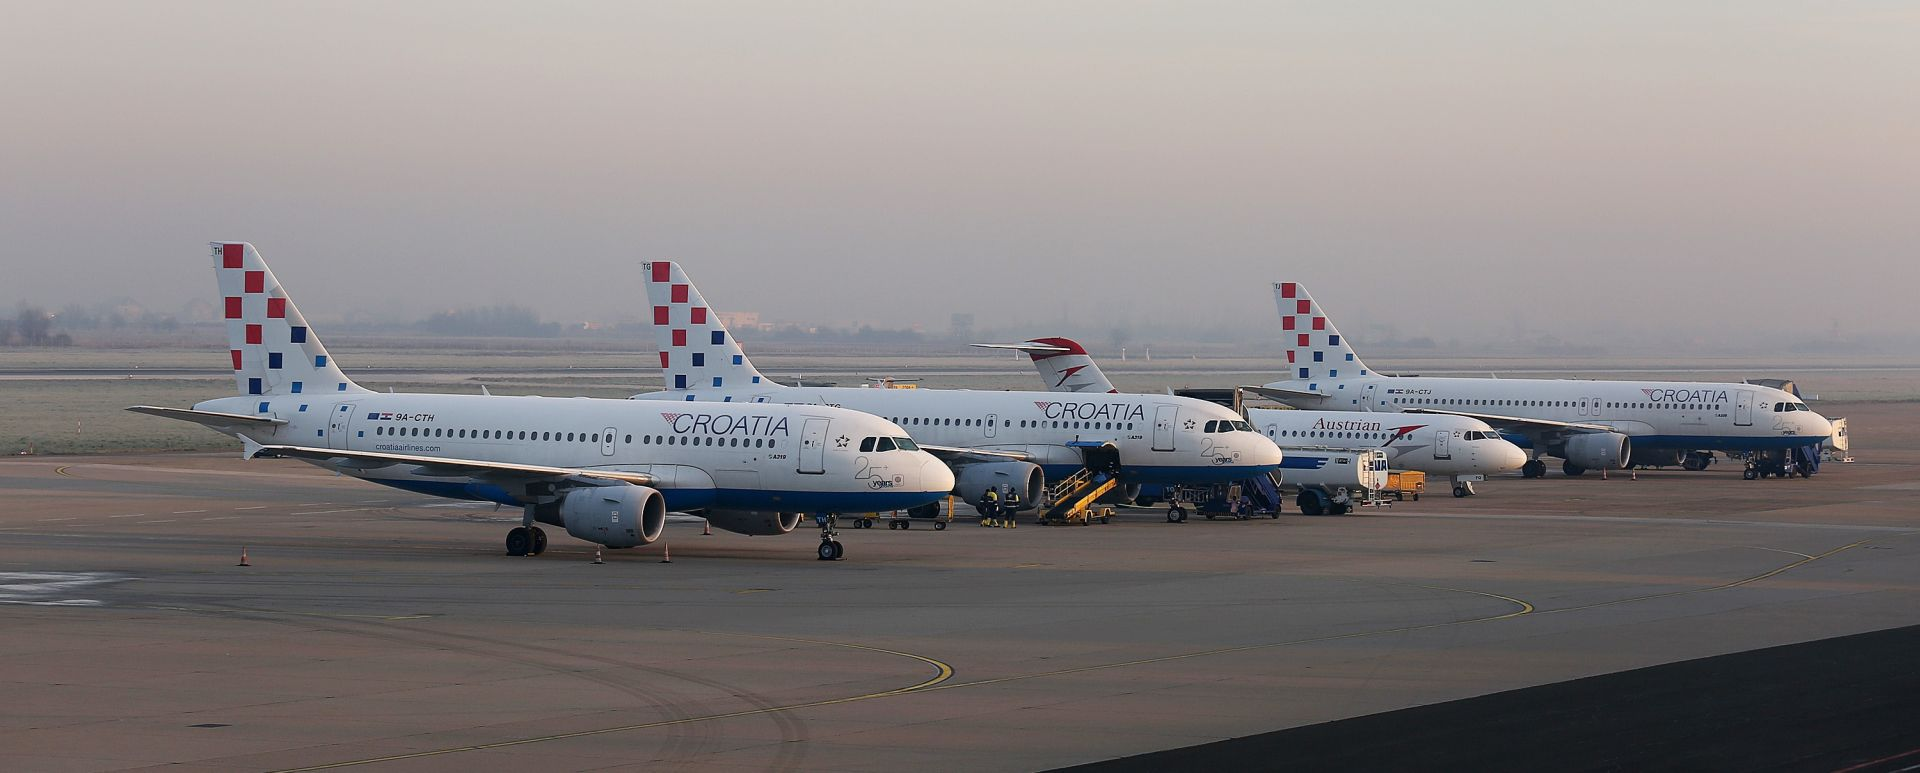 Croatia Airlines uvodi izravne letove za Lisabon, Milano, Prag i Sankt Peterburg